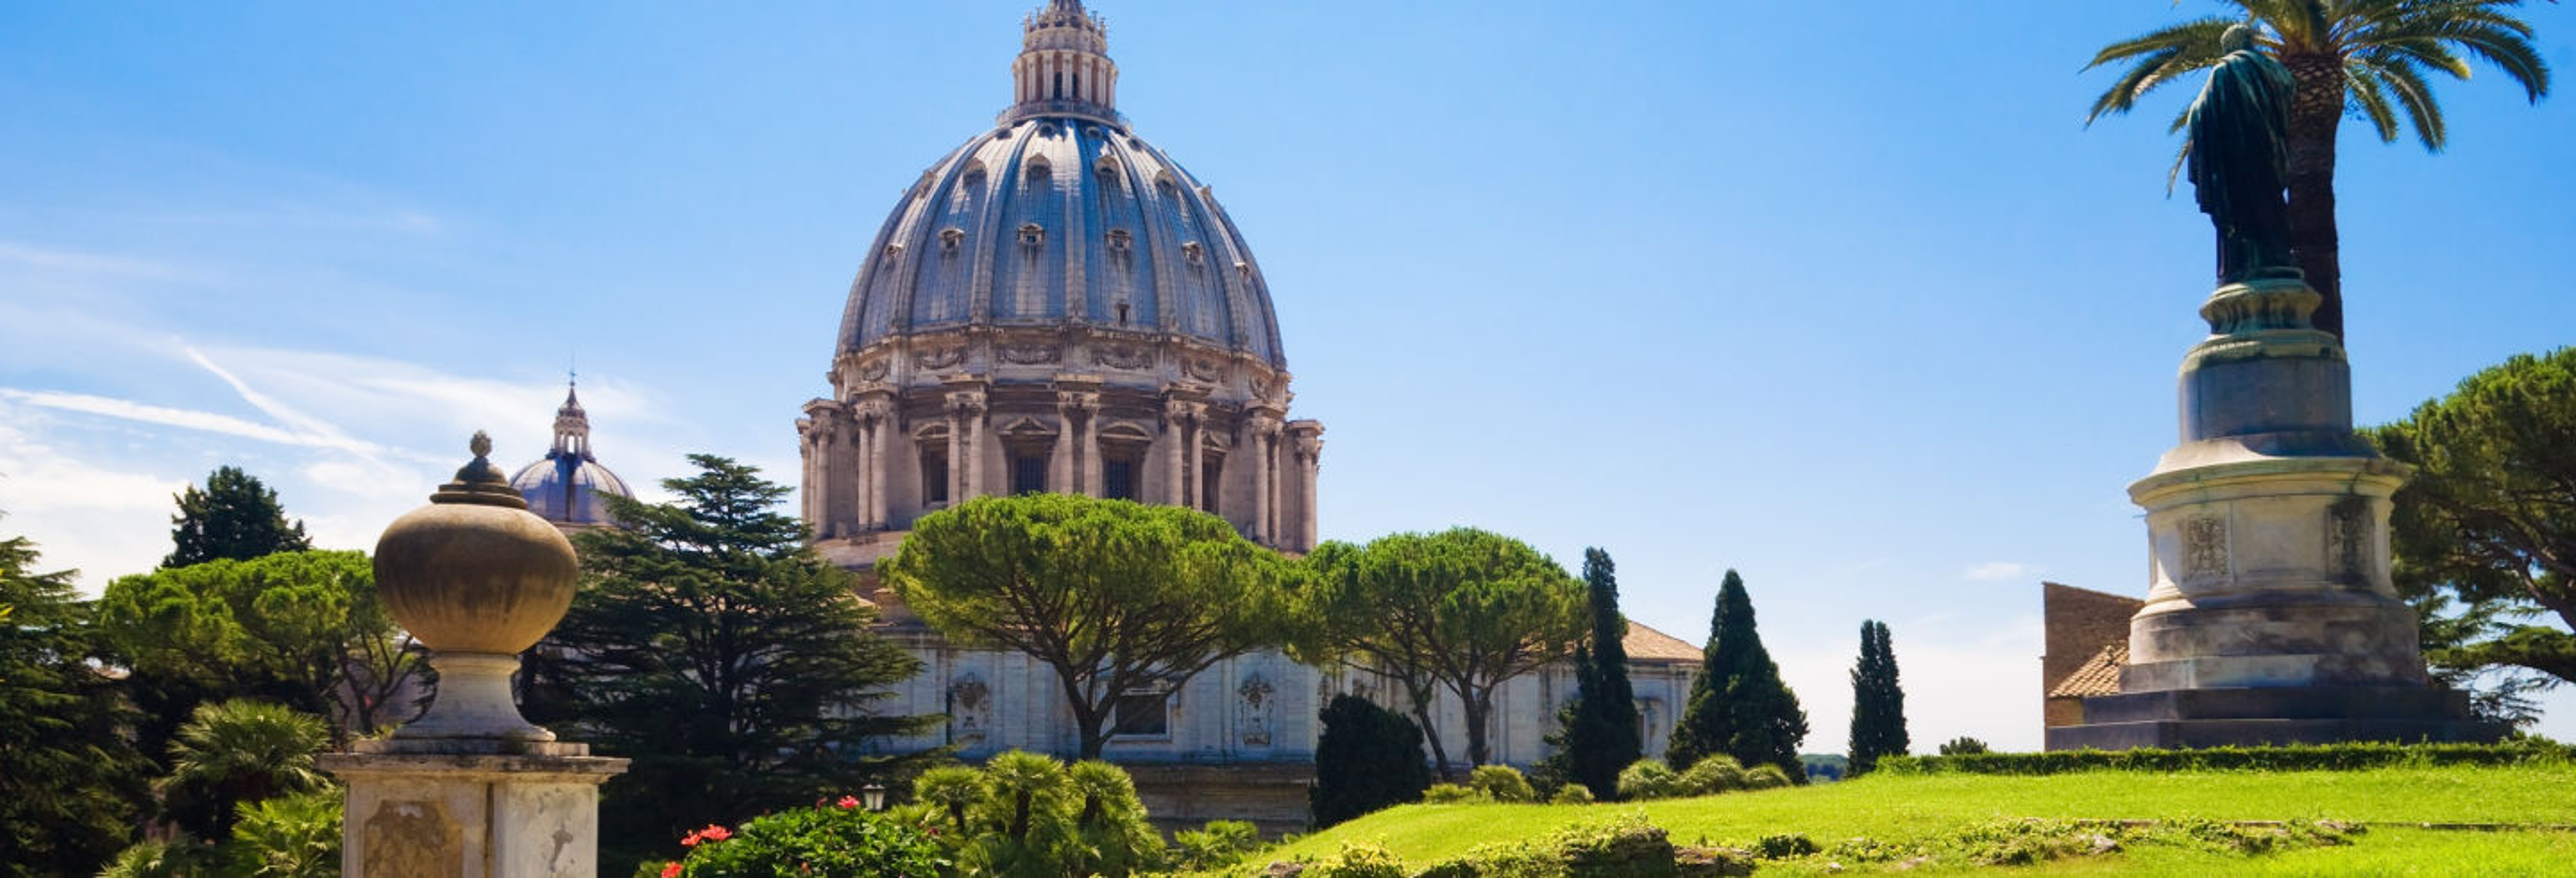 Vatican Museum Tour + Gardens